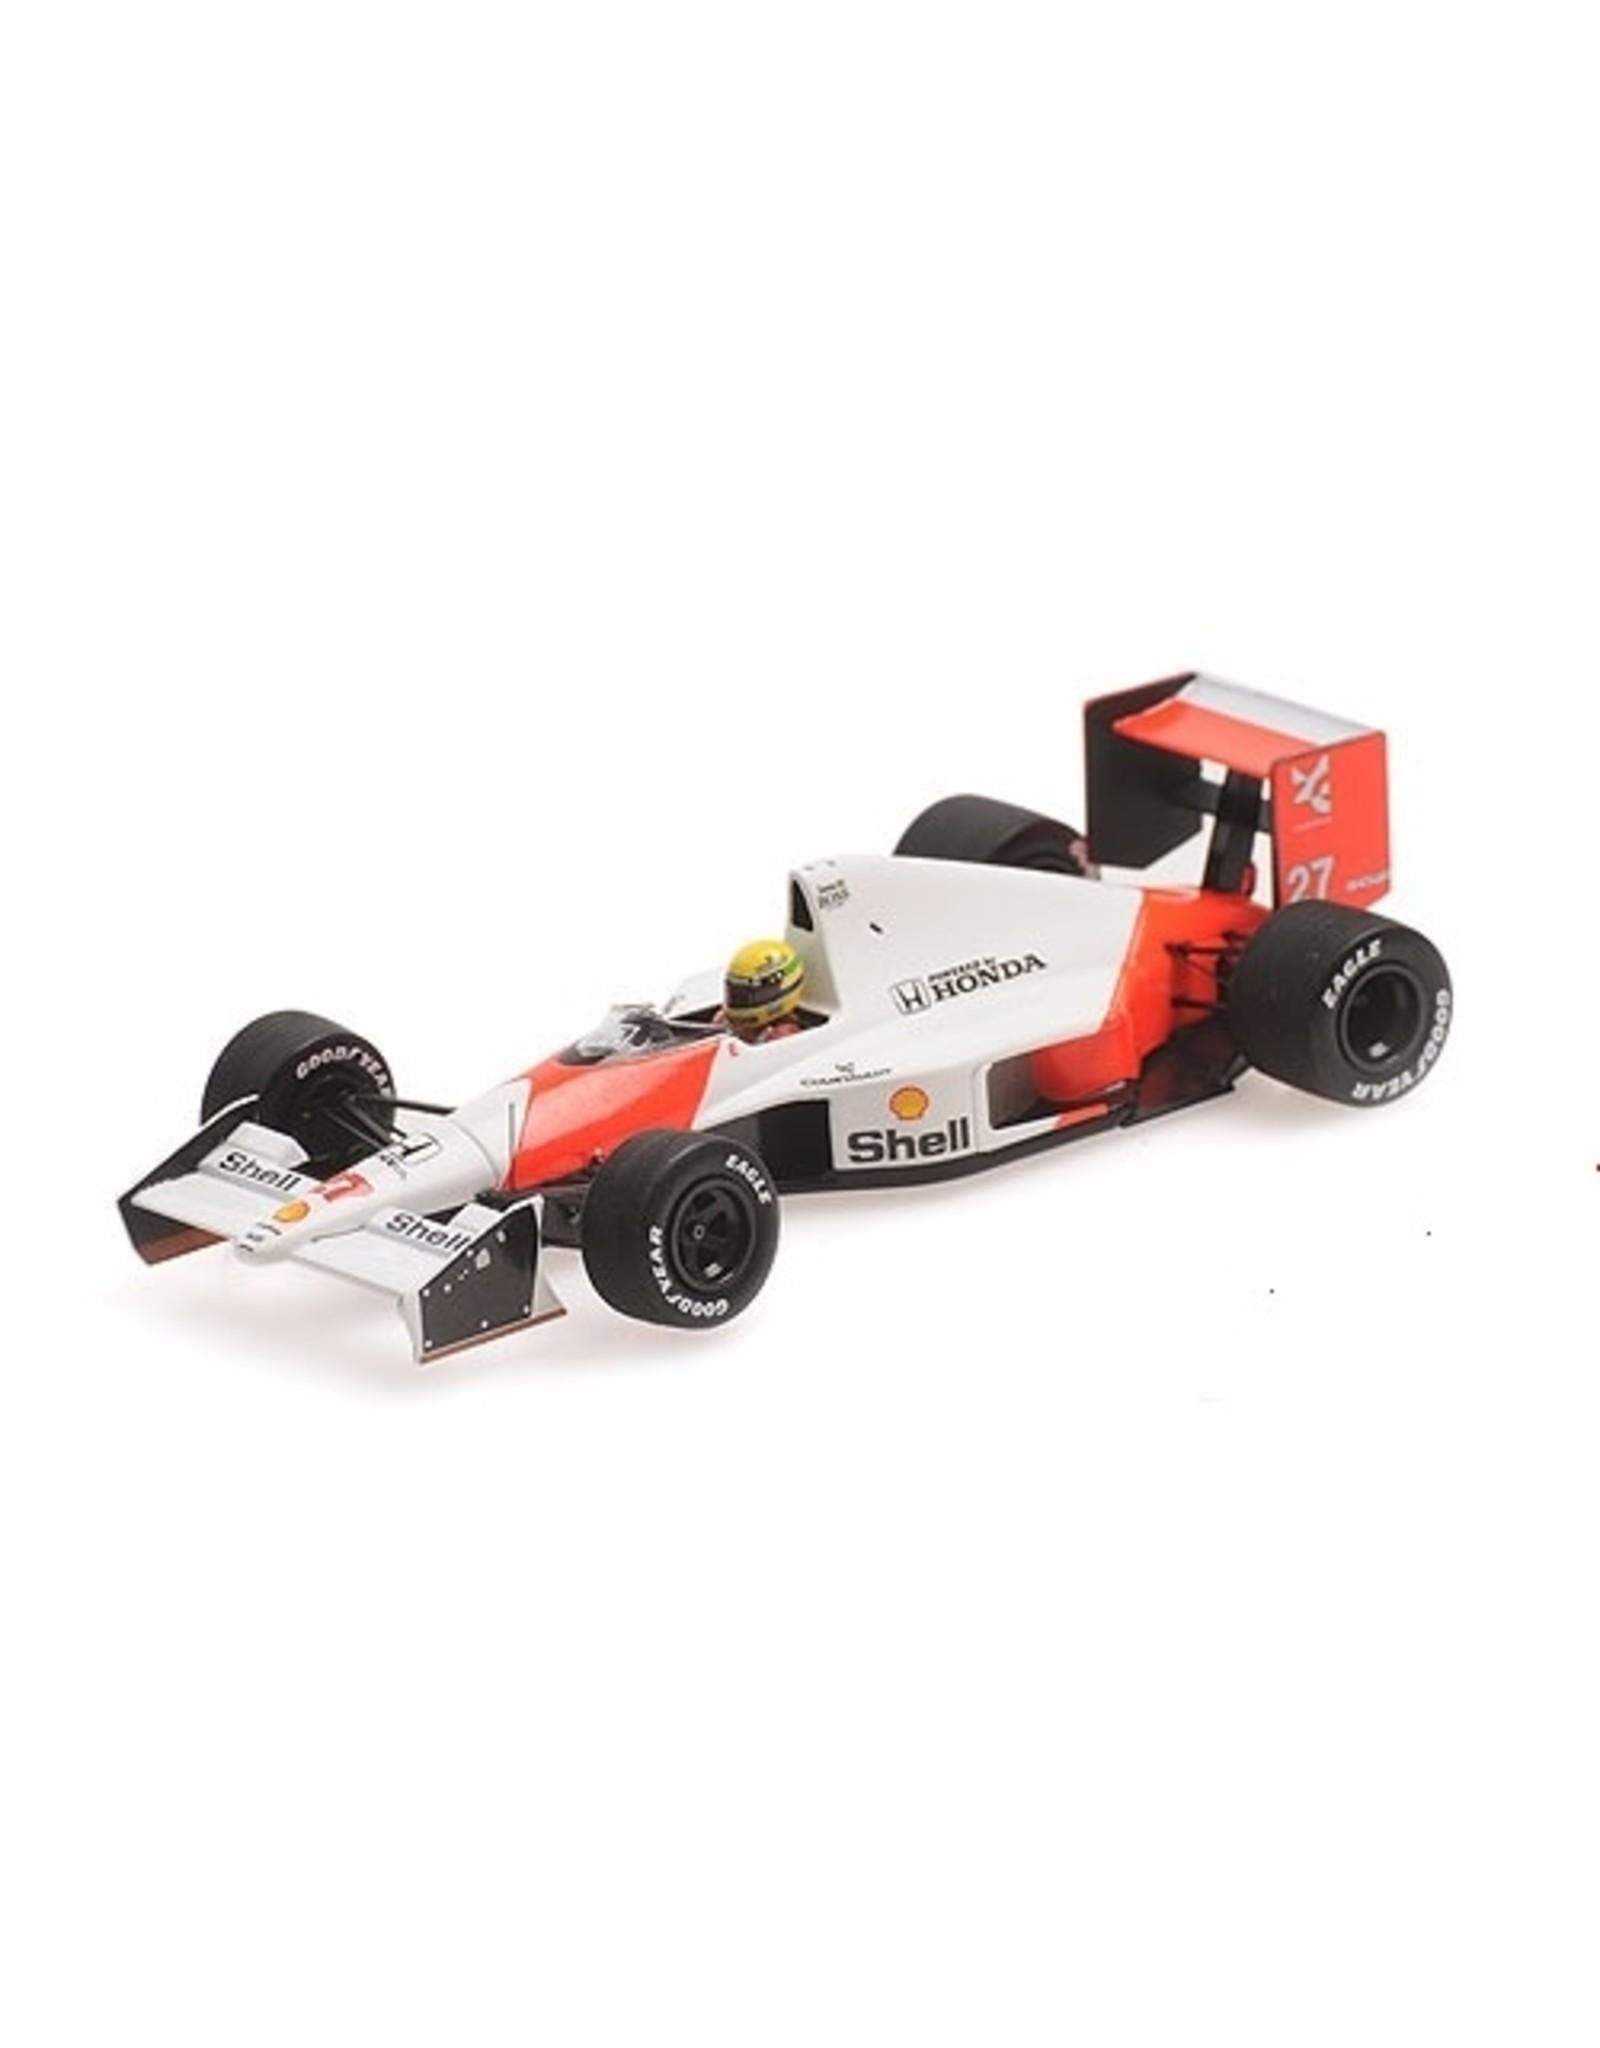 Formule 1 McLaren Honda MP4/5B #27 Elevated Nose Cone Test Car Monza 1990  - 1:43 - Minichamps